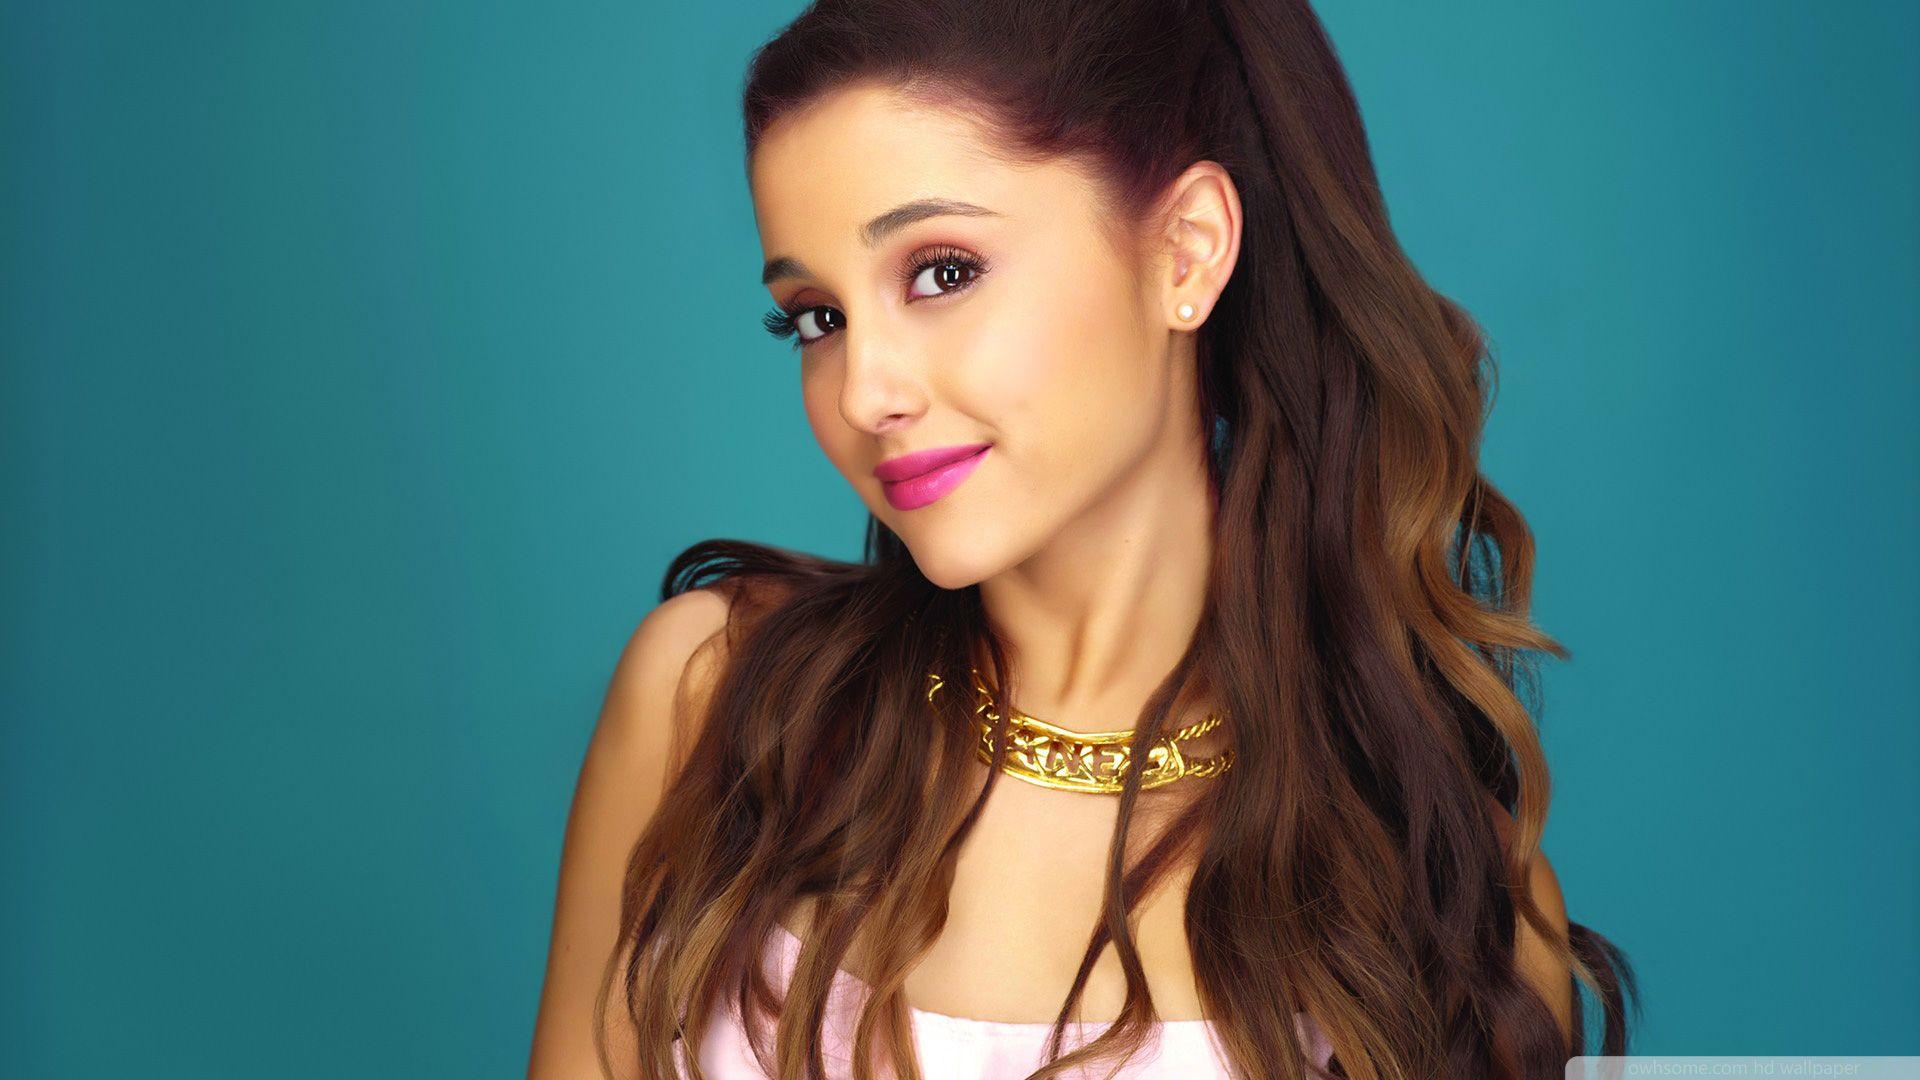 Download Ariana Grande Hd Desktop Wallpaper Arianagrande Wallpaper Ariana Grande Pictures Ariana Grande Hair Styles